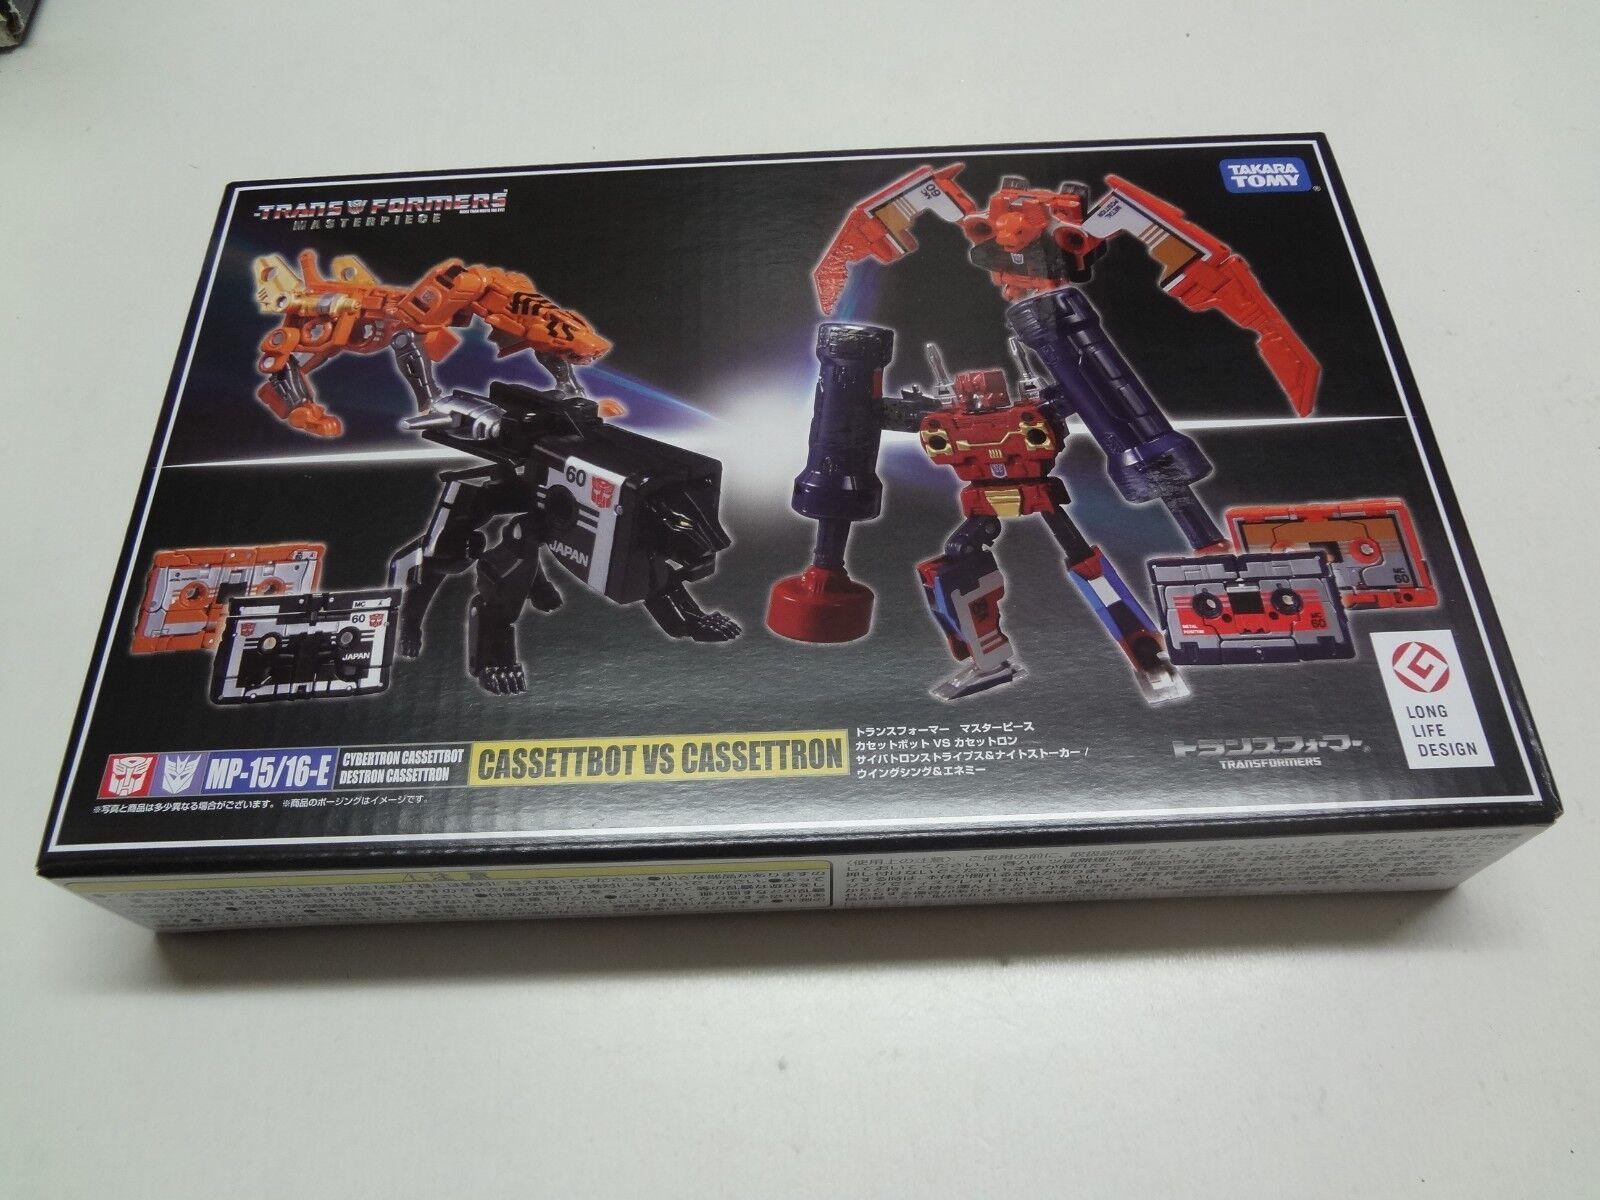 Transformers Masterpiece MP-15/16E Cassetbot VS Cassettron Takara Tomy Japan NEW